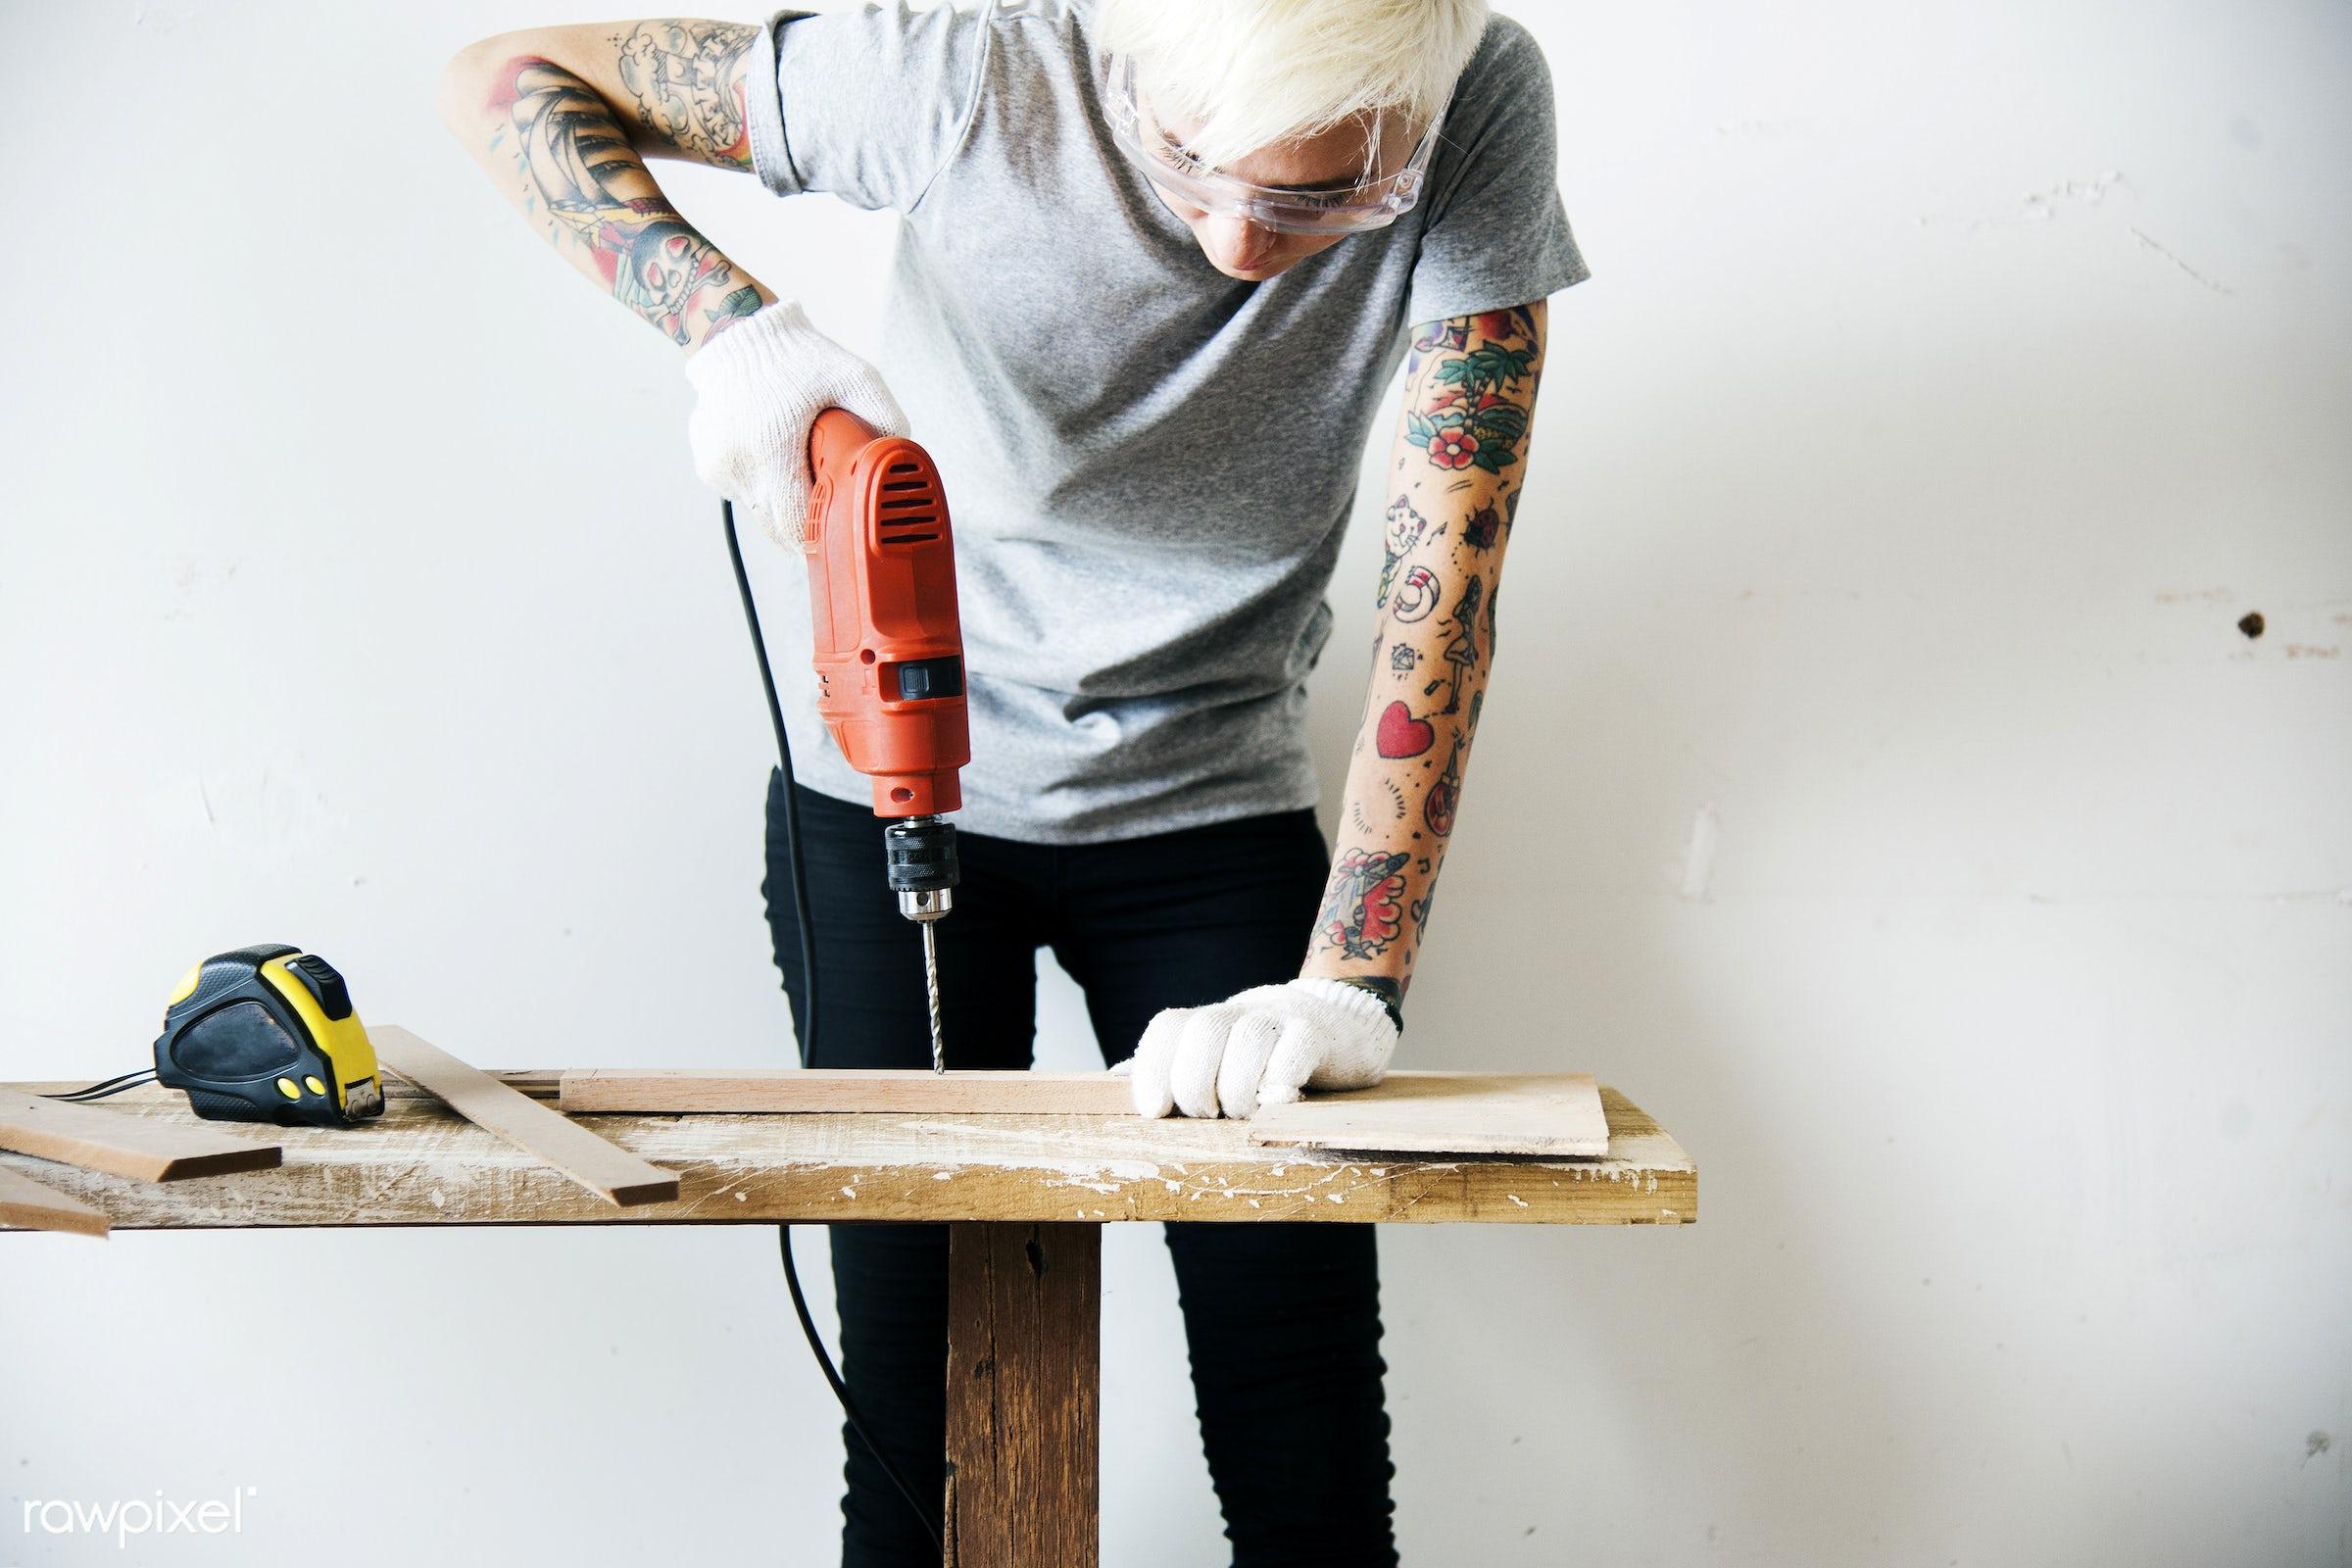 woman, construction, diy, activity, american, augers, british, carpenter, carpentry, craft, craftsman, design, drill,...